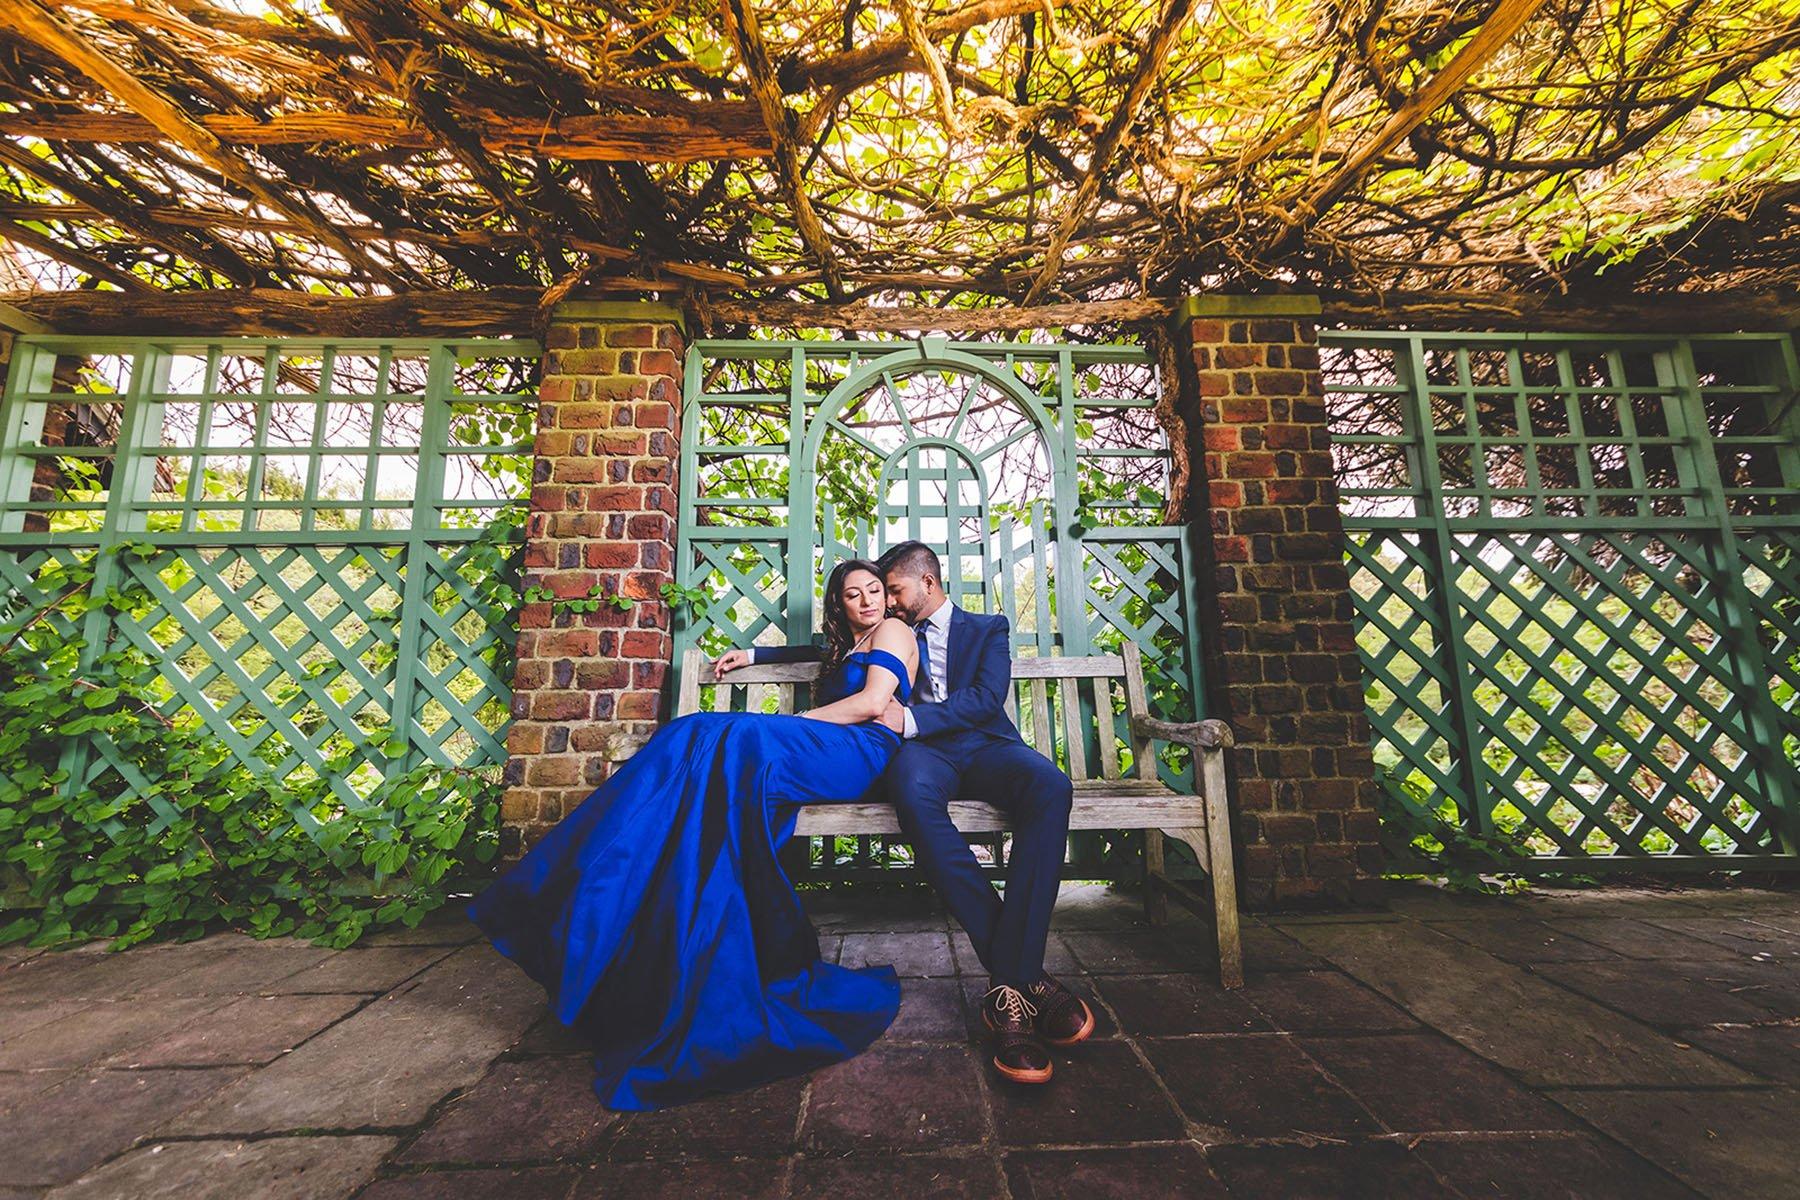 Engagement-Shoot-in-Planting-Fields-Arboretum ENGAGEMENTS